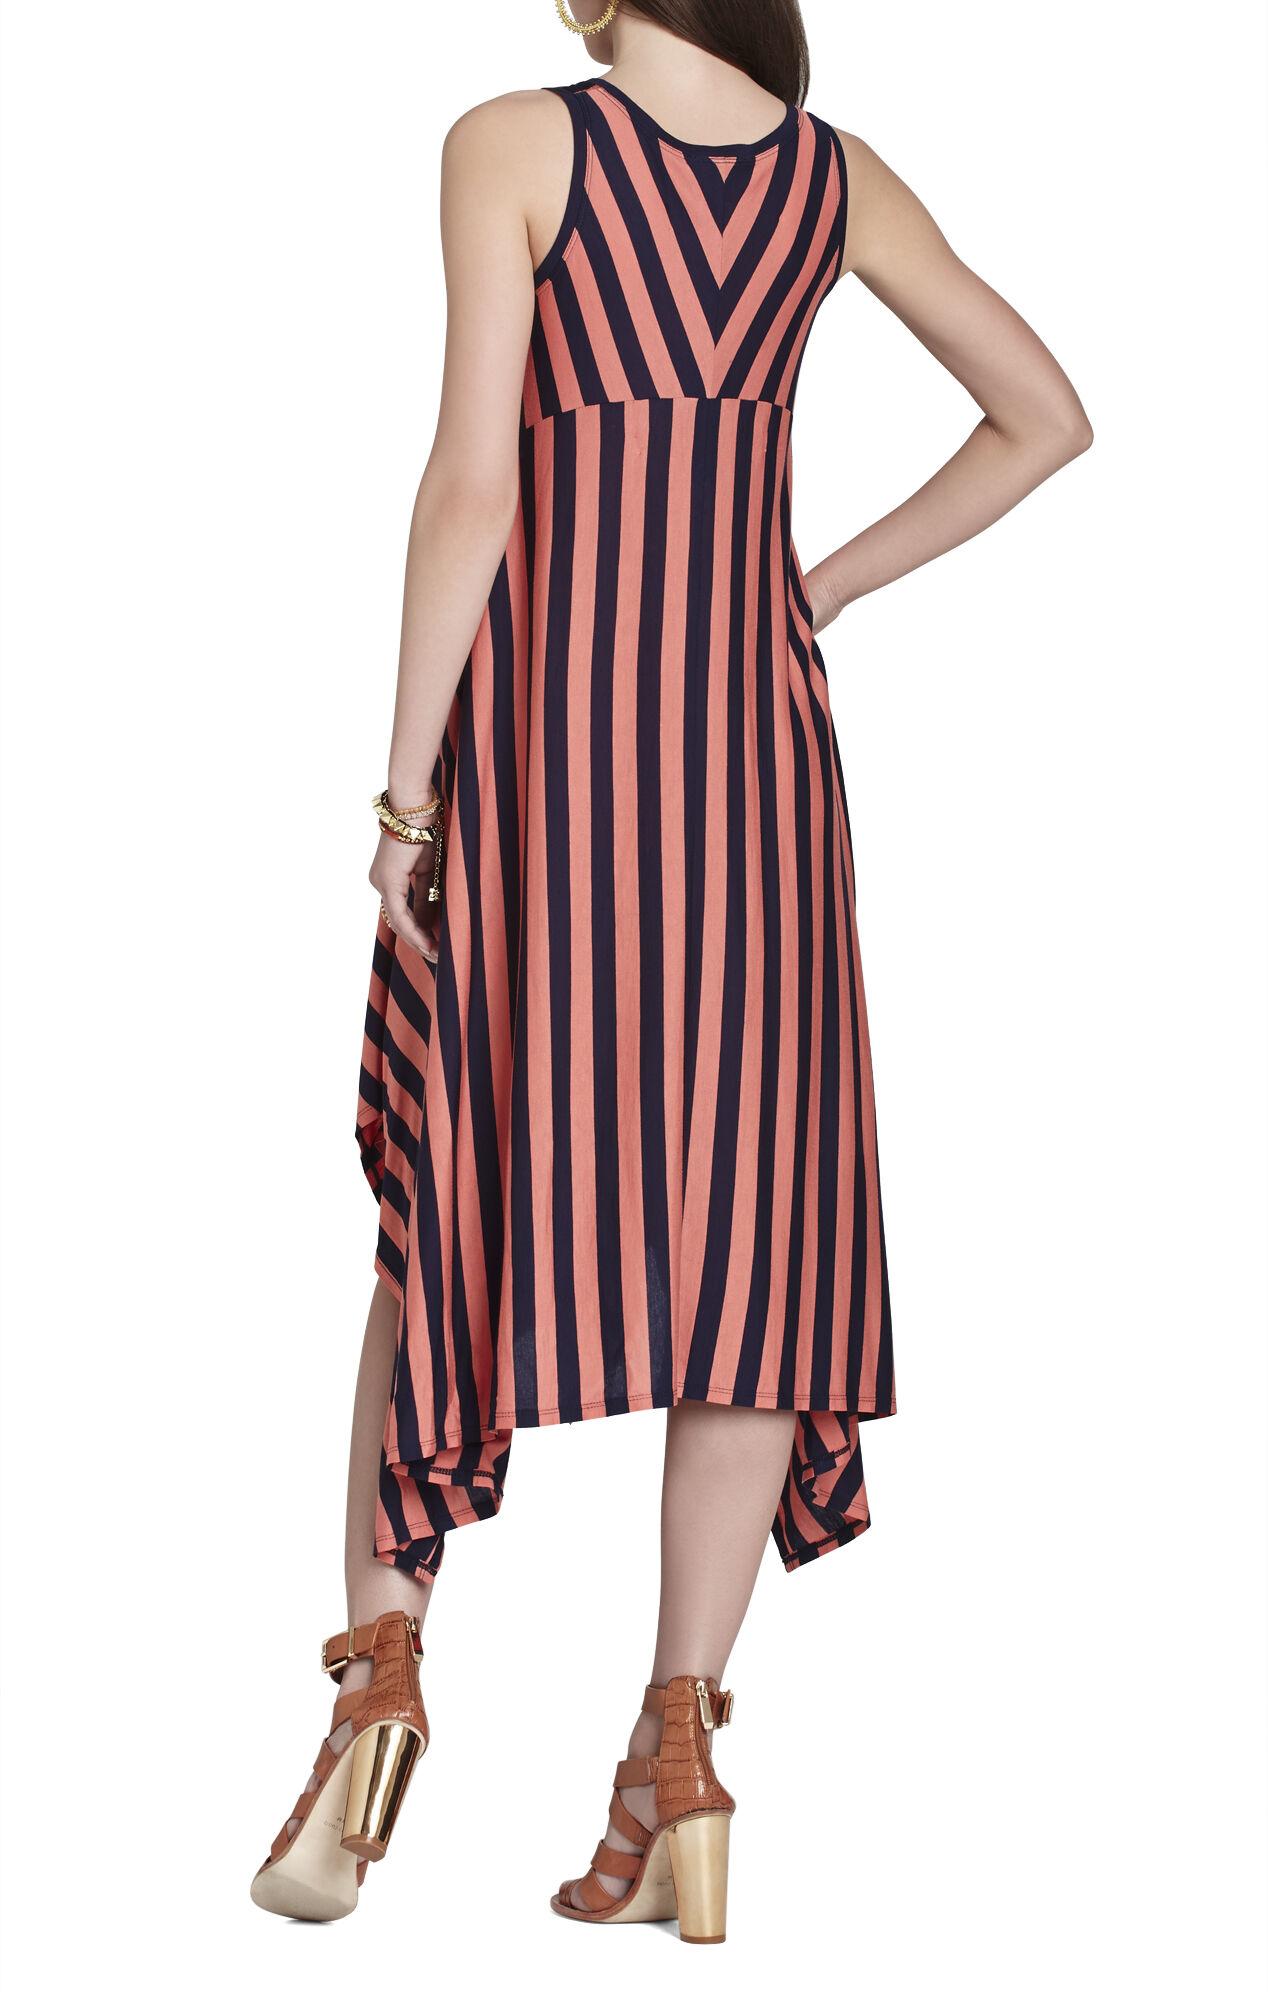 Mylene Handkerchief-Hem Knit Dress